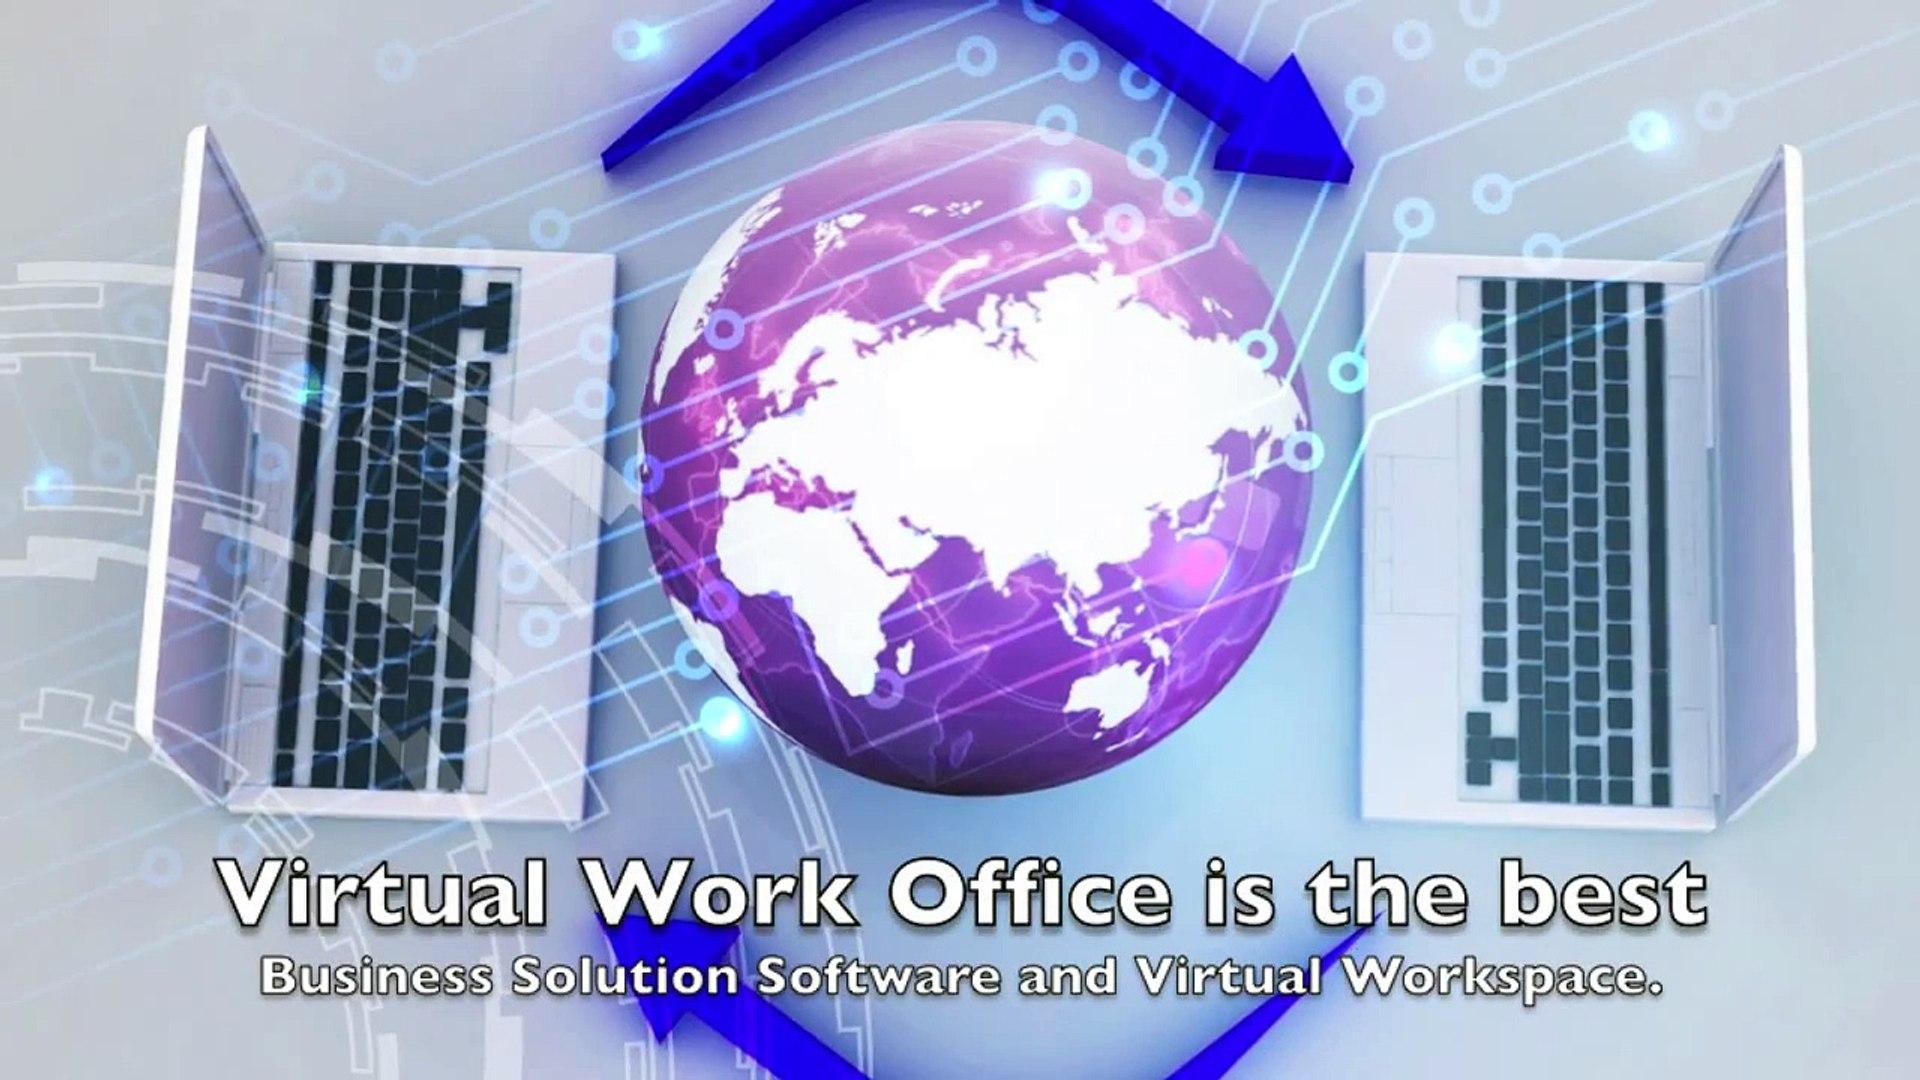 Virtual Work Office - Virtual Workspace